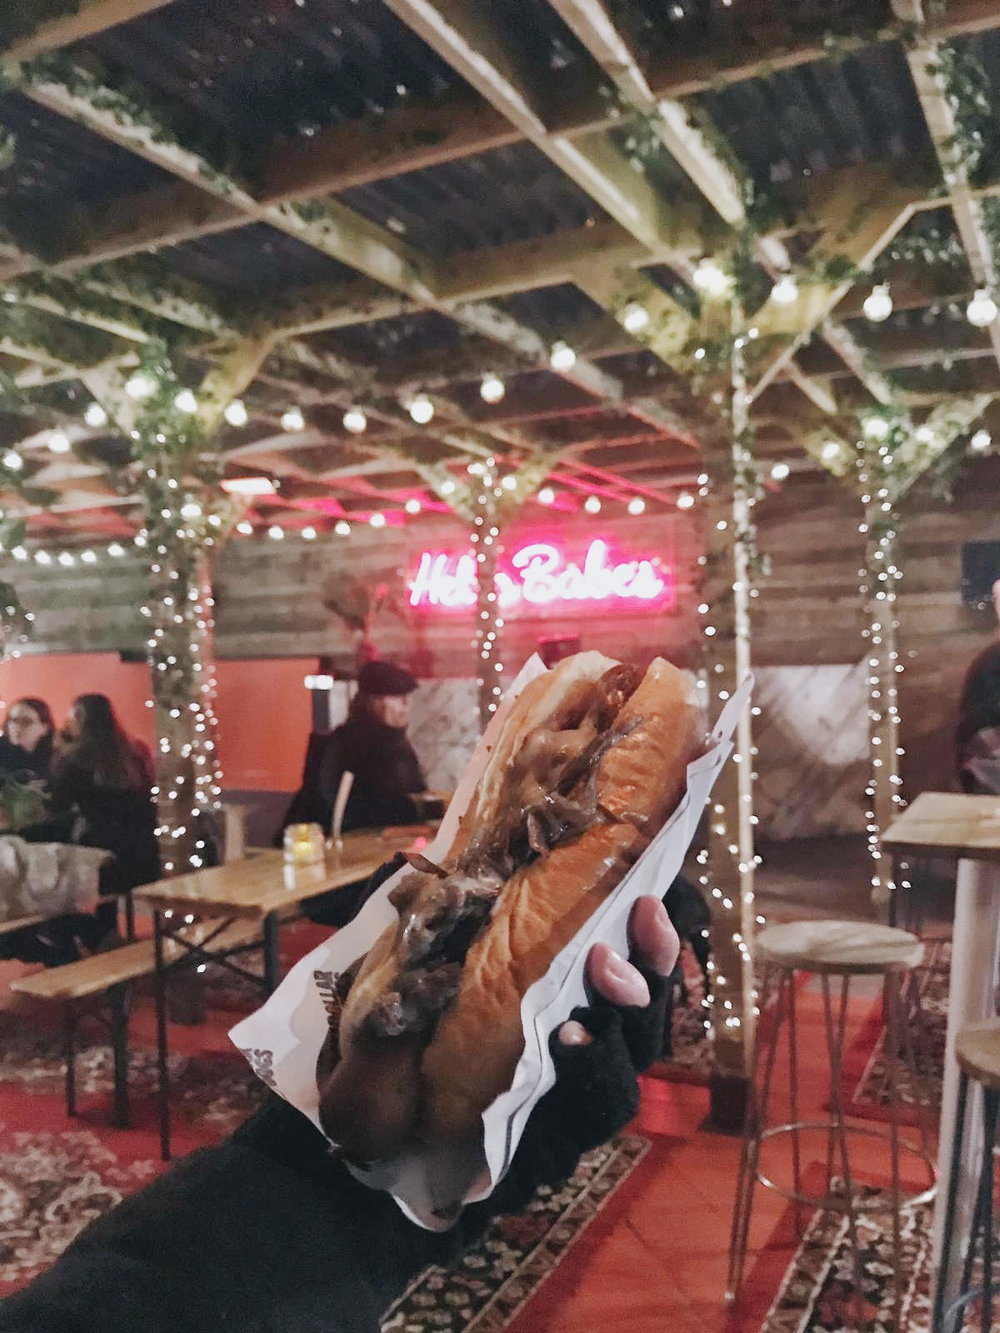 Vegan hotdog at Bussey rooftop bar